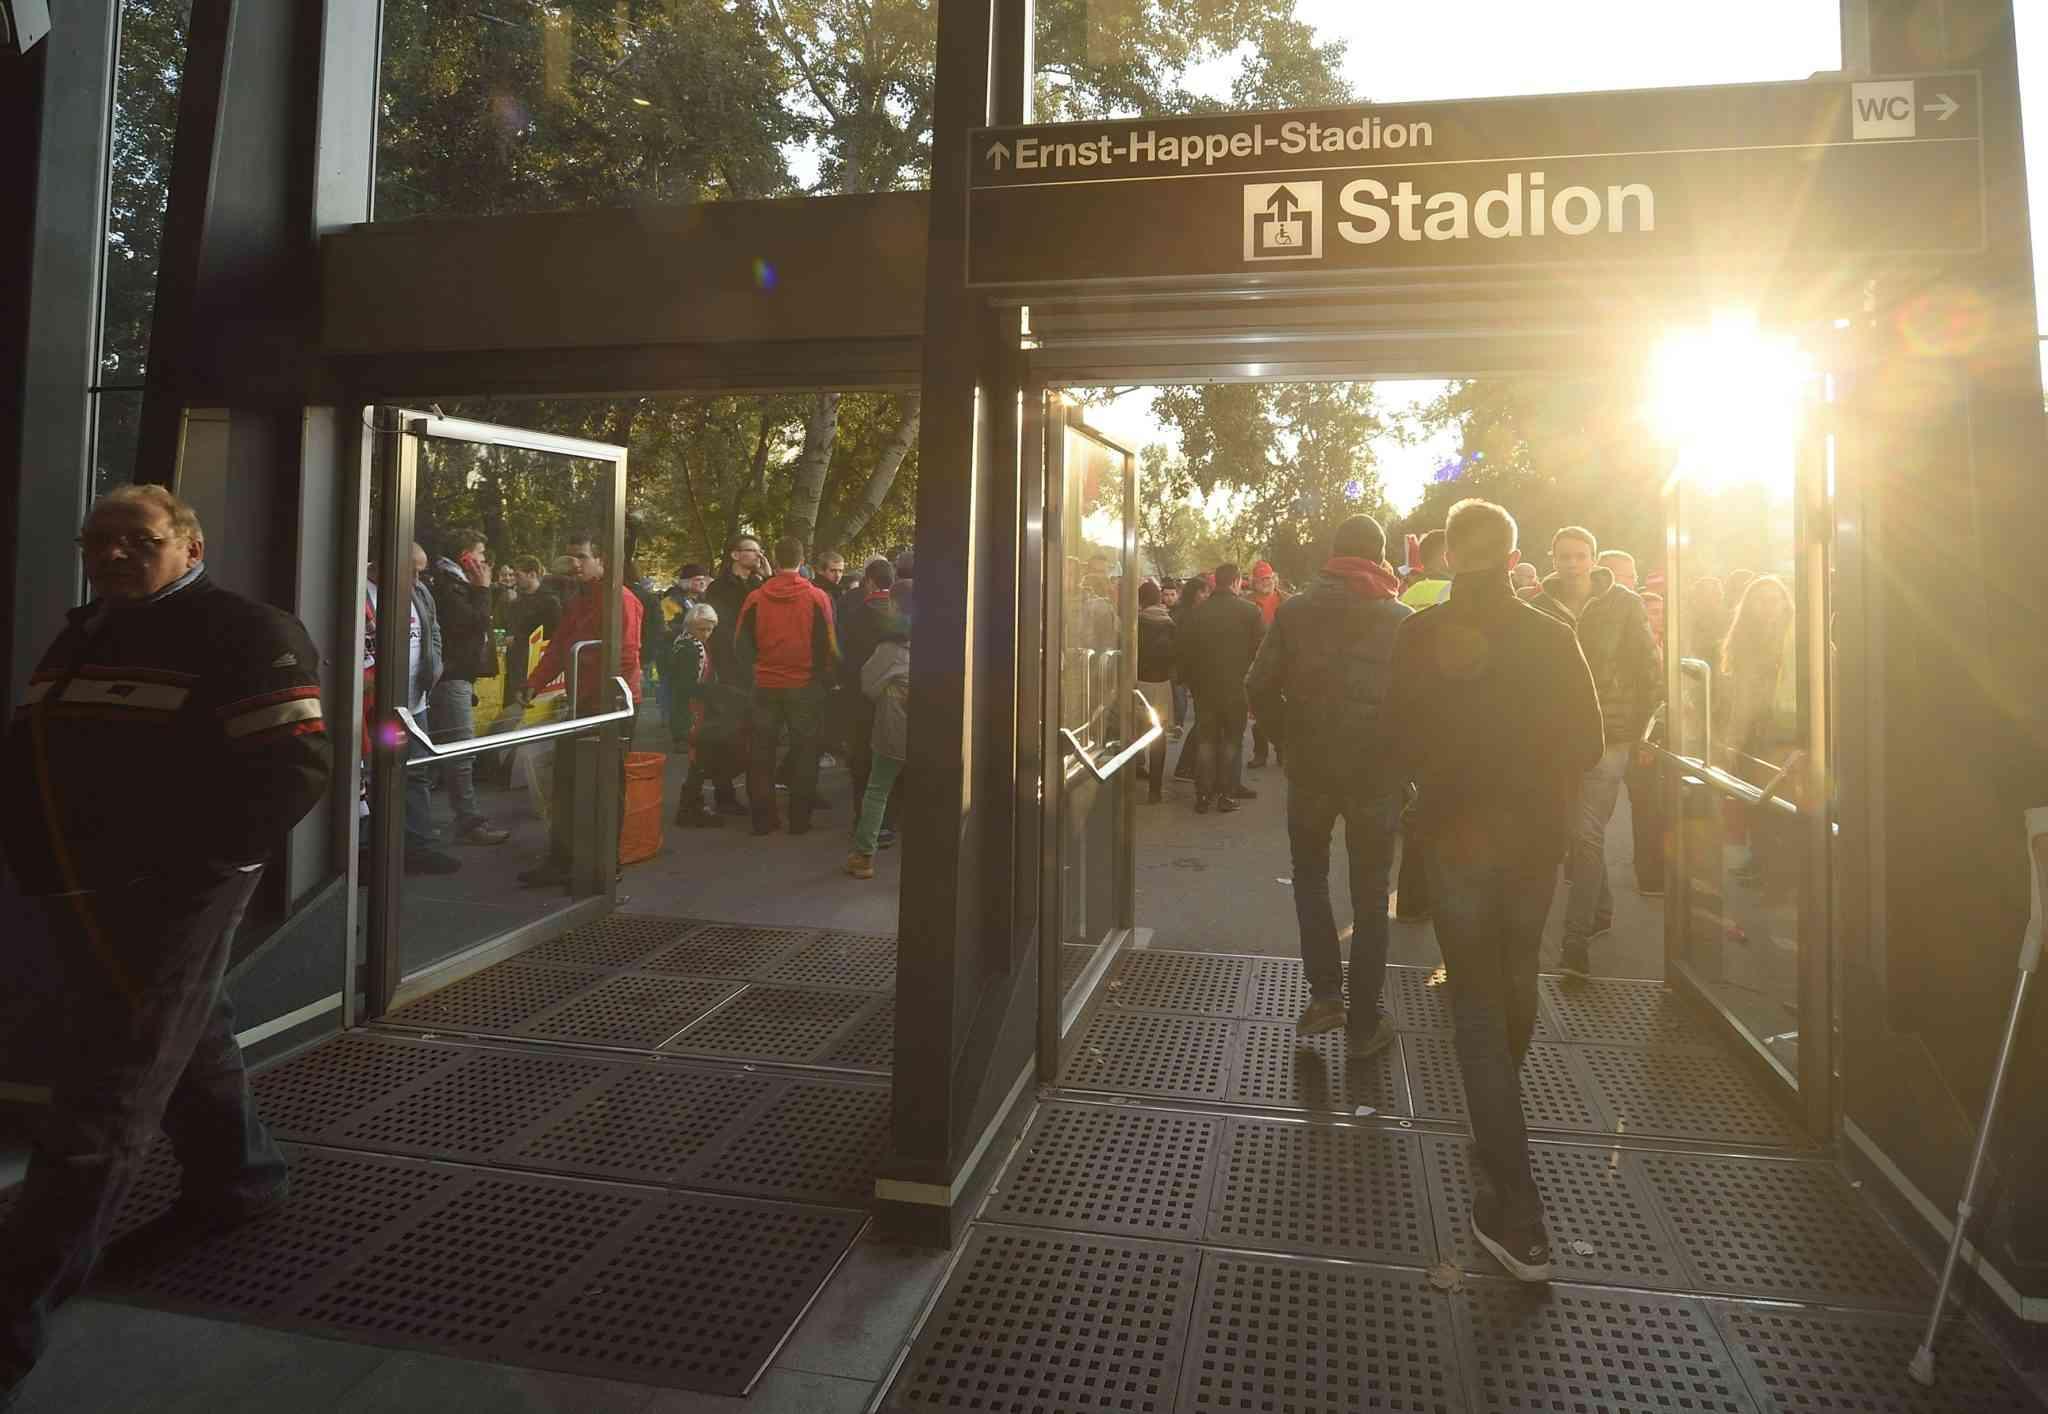 U2-Station Stadion